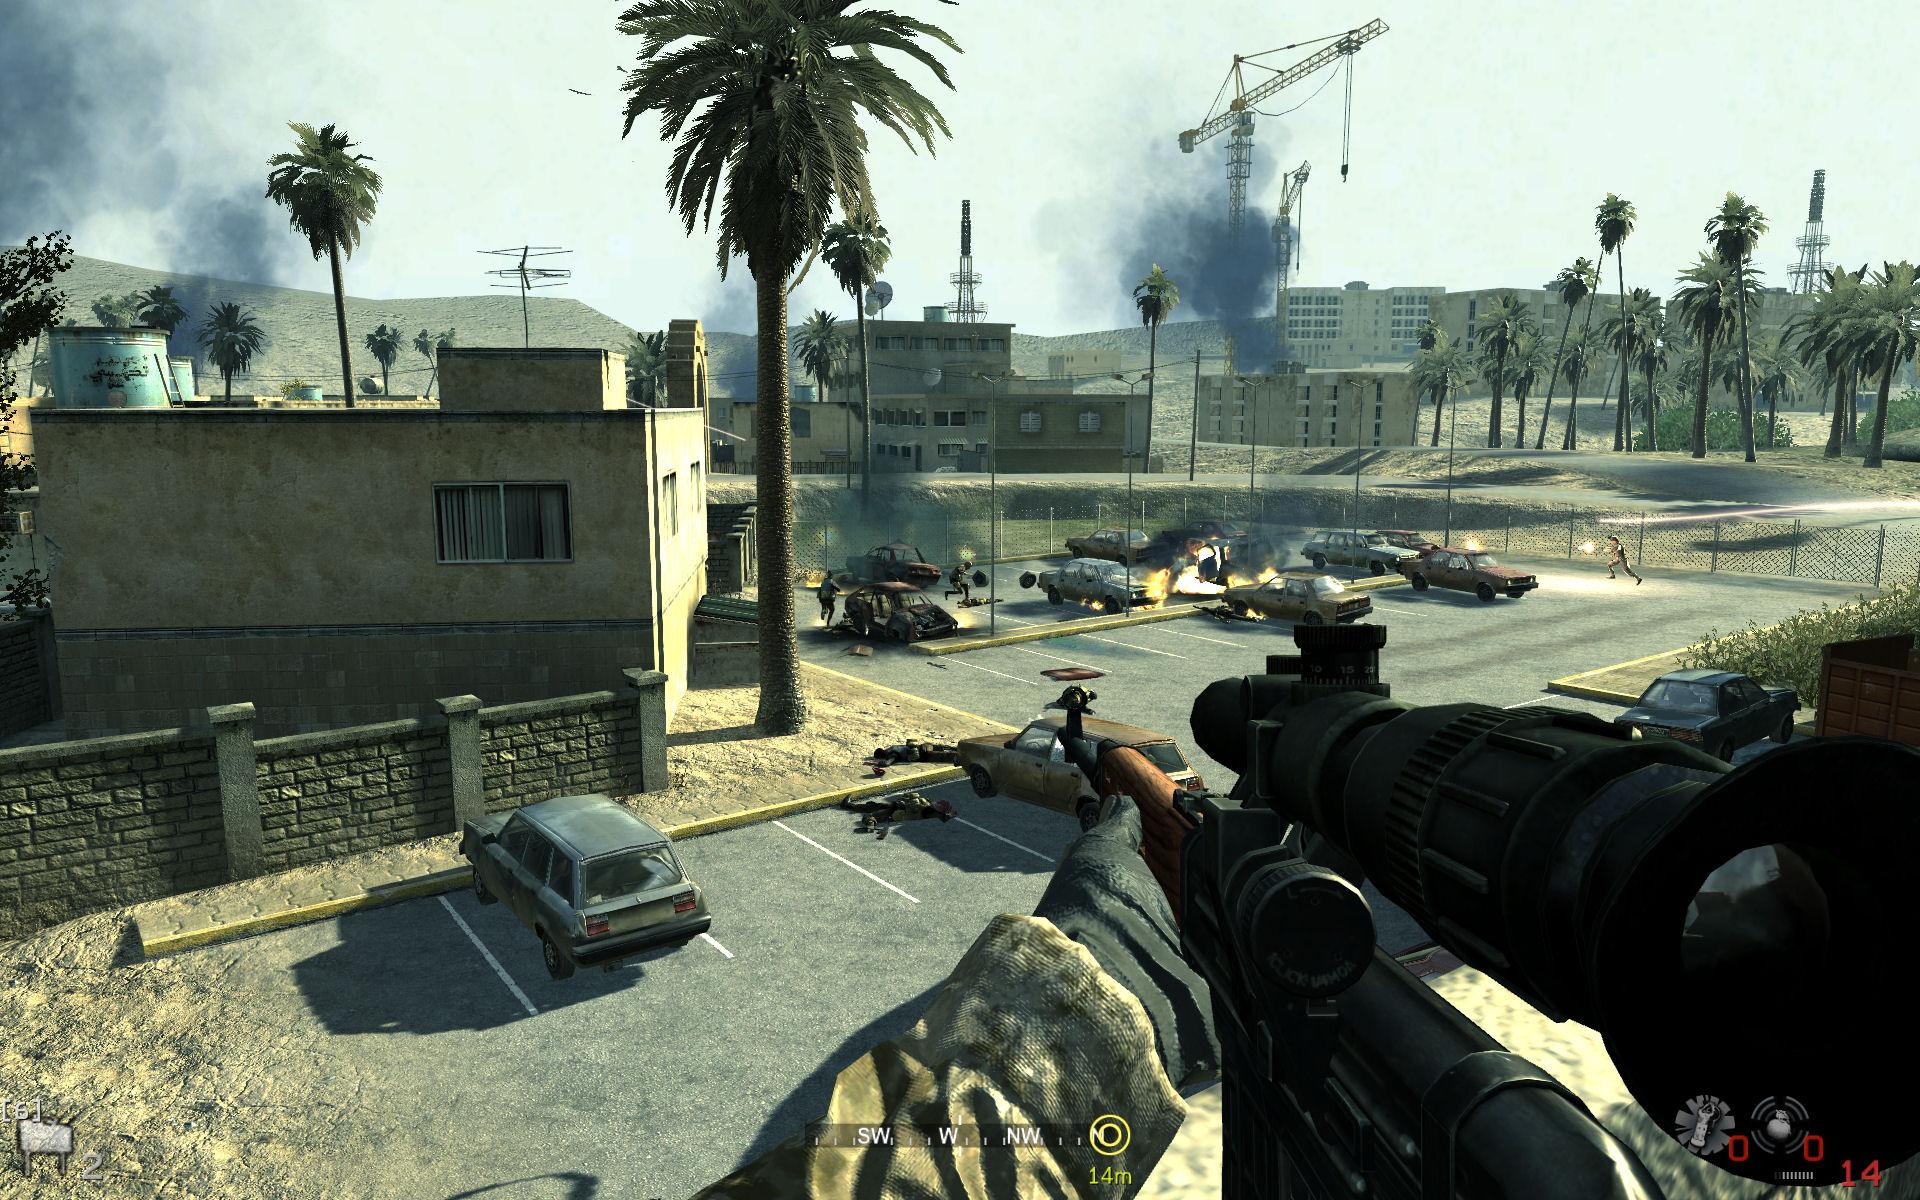 Call of Duty WWII - United Front: μια σύντομη αναδρομή και ένα μεγάλο δώρο από τα Public!